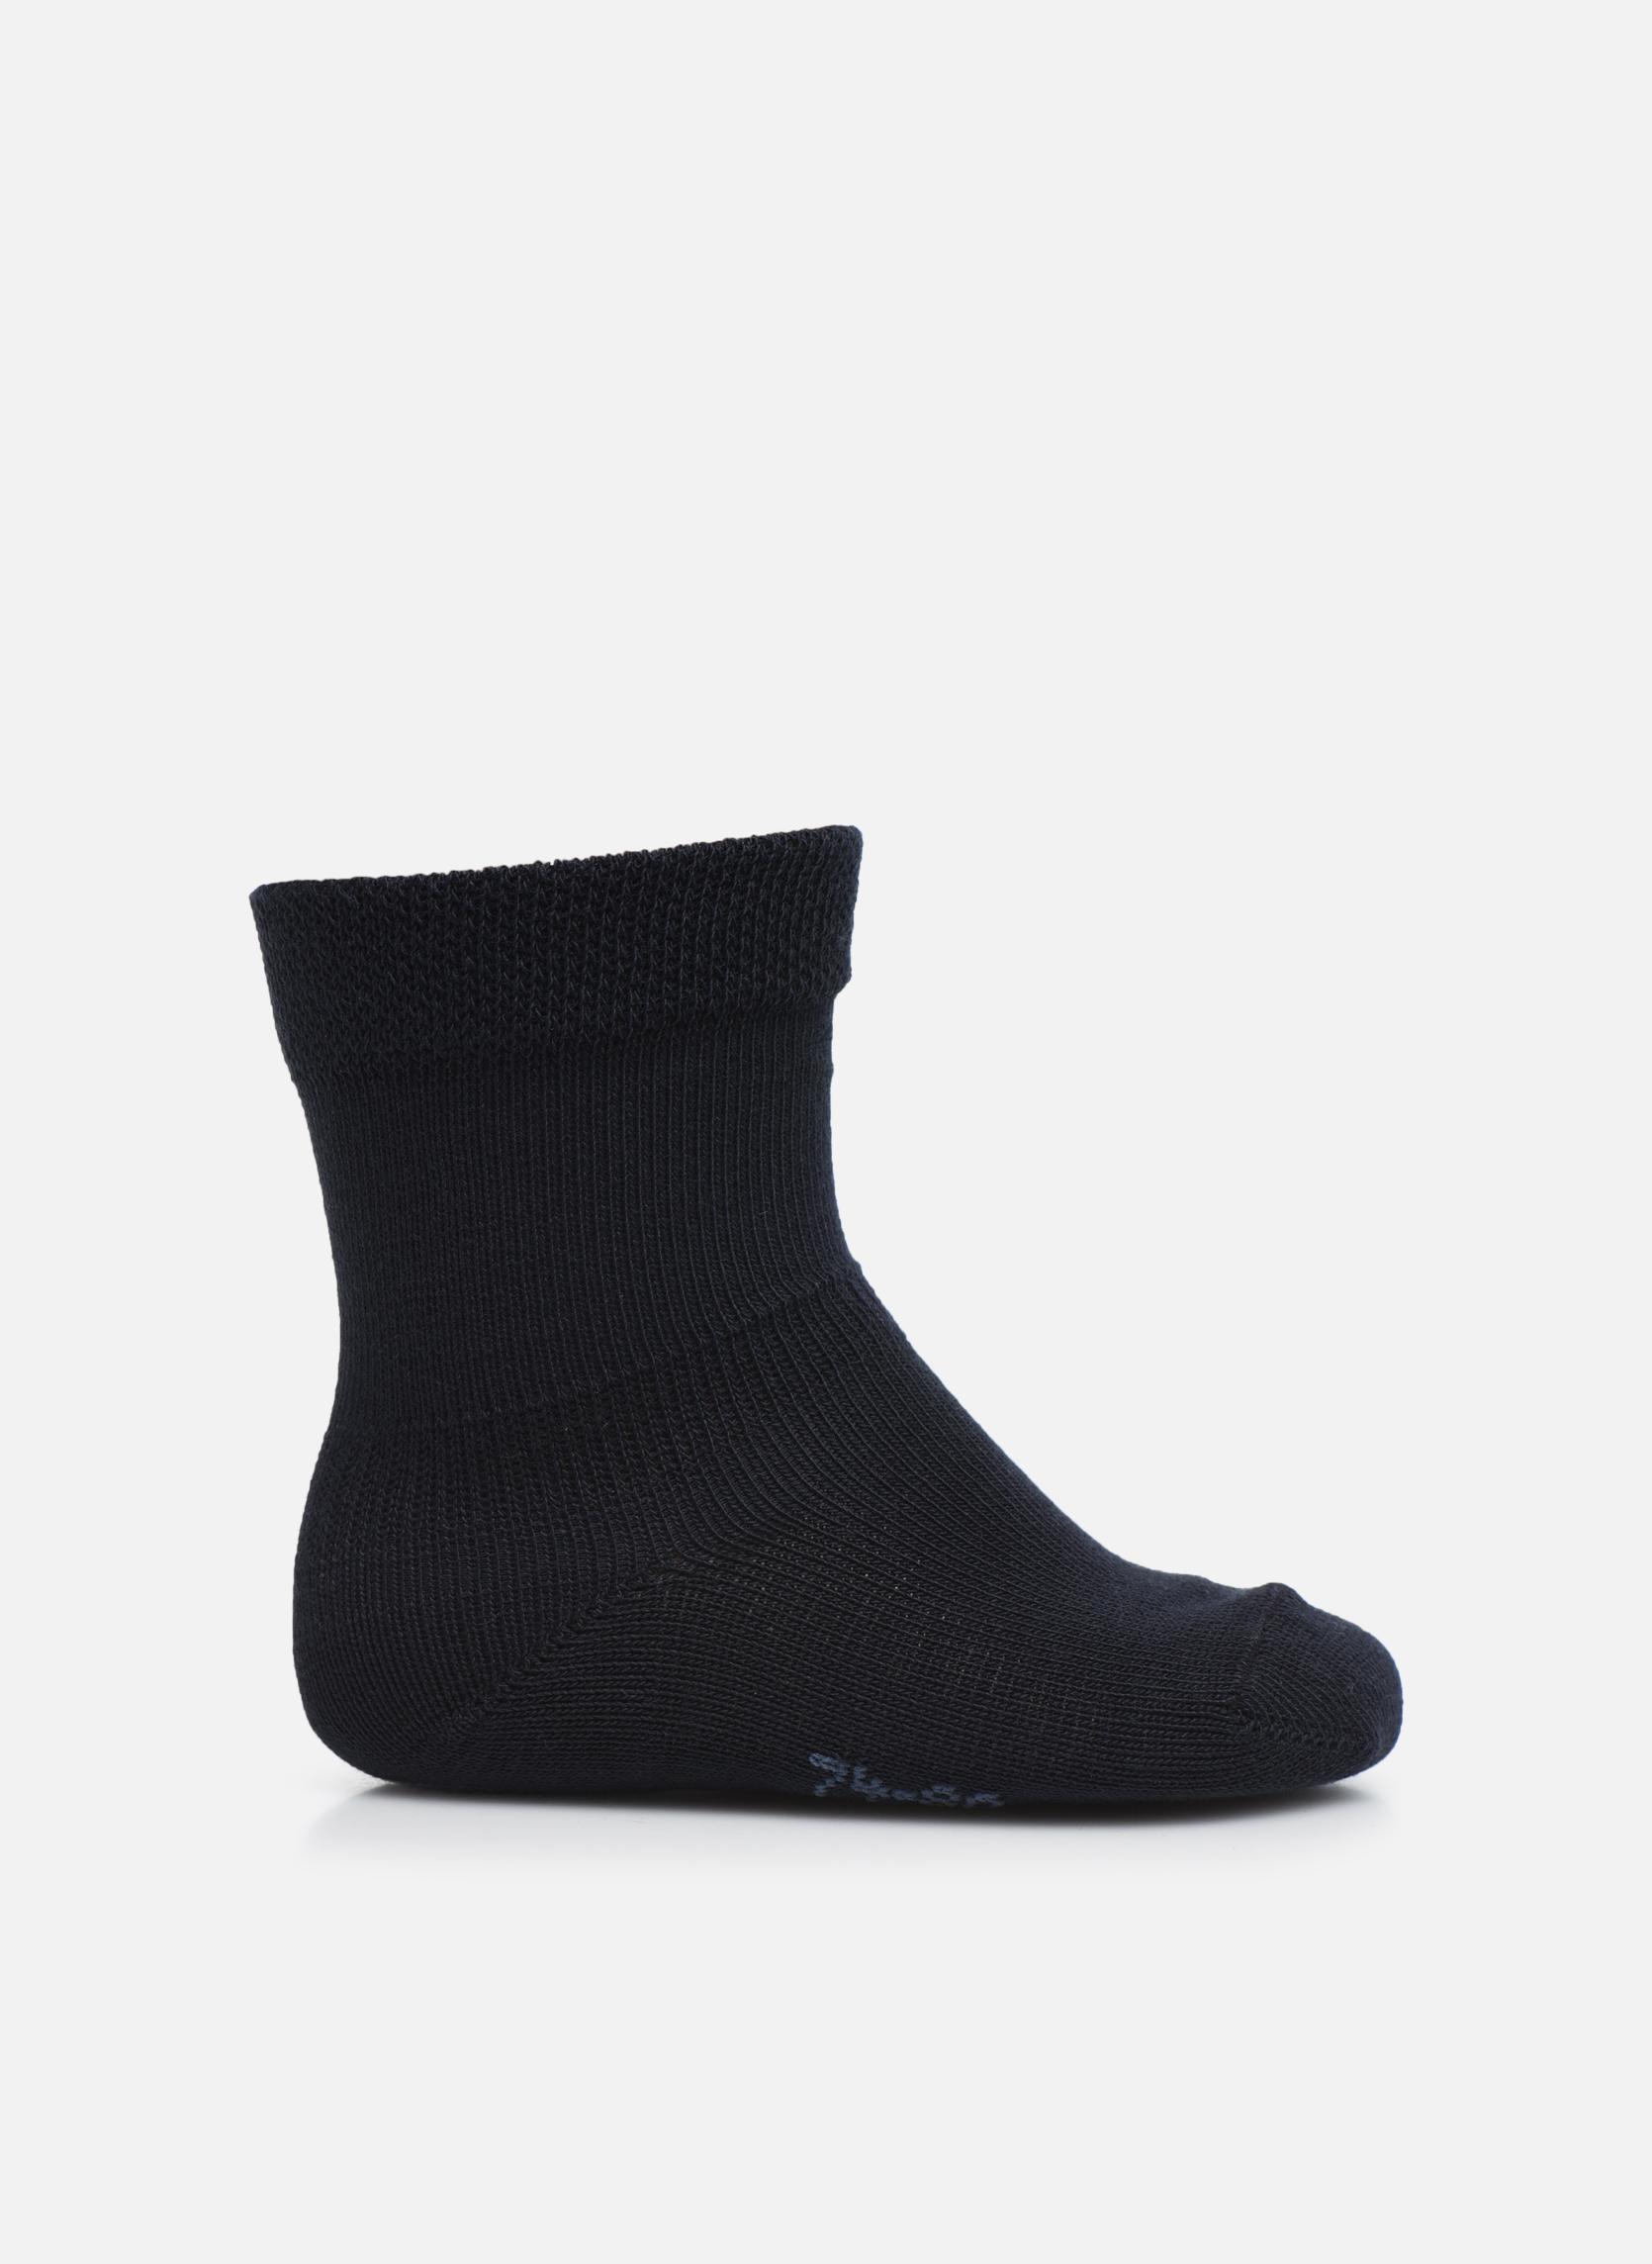 Sokken en panty's Accessoires Sokken SENSITIVE